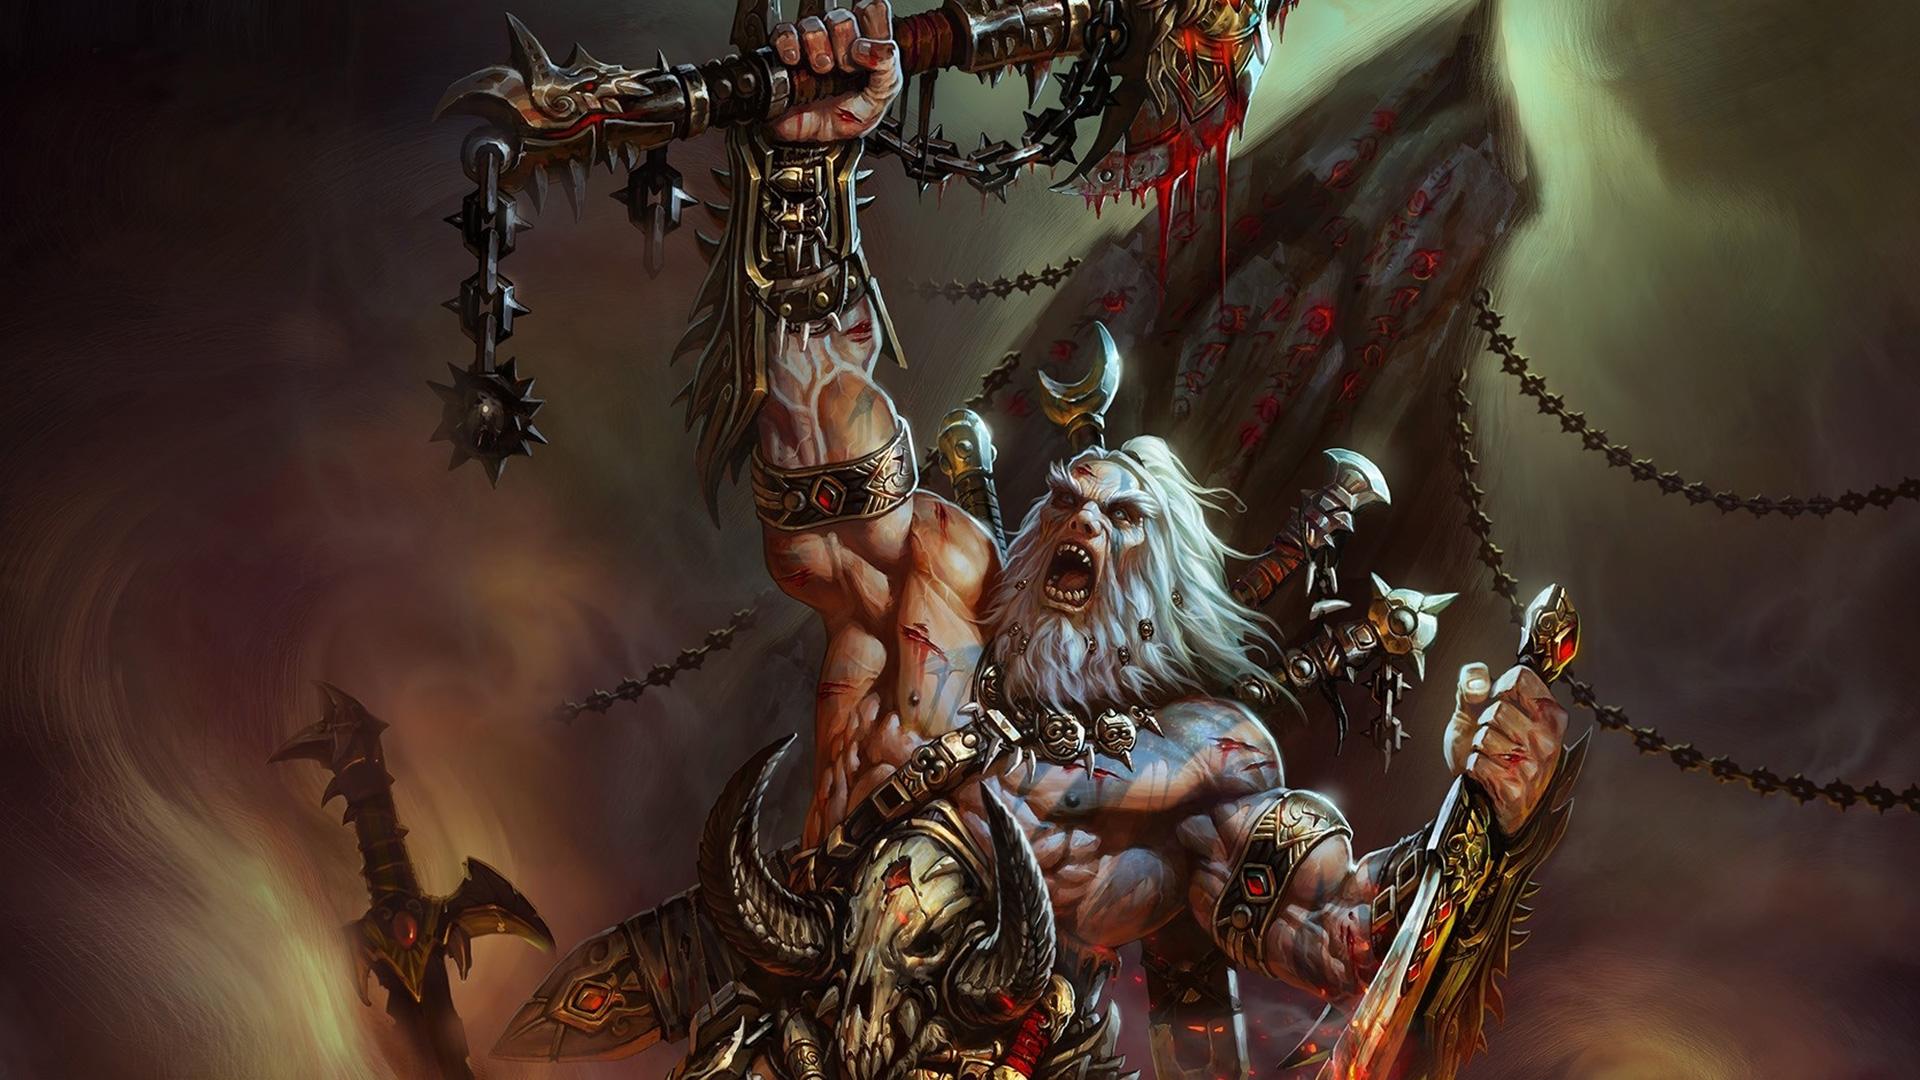 Diablo 3 wallpaper 49